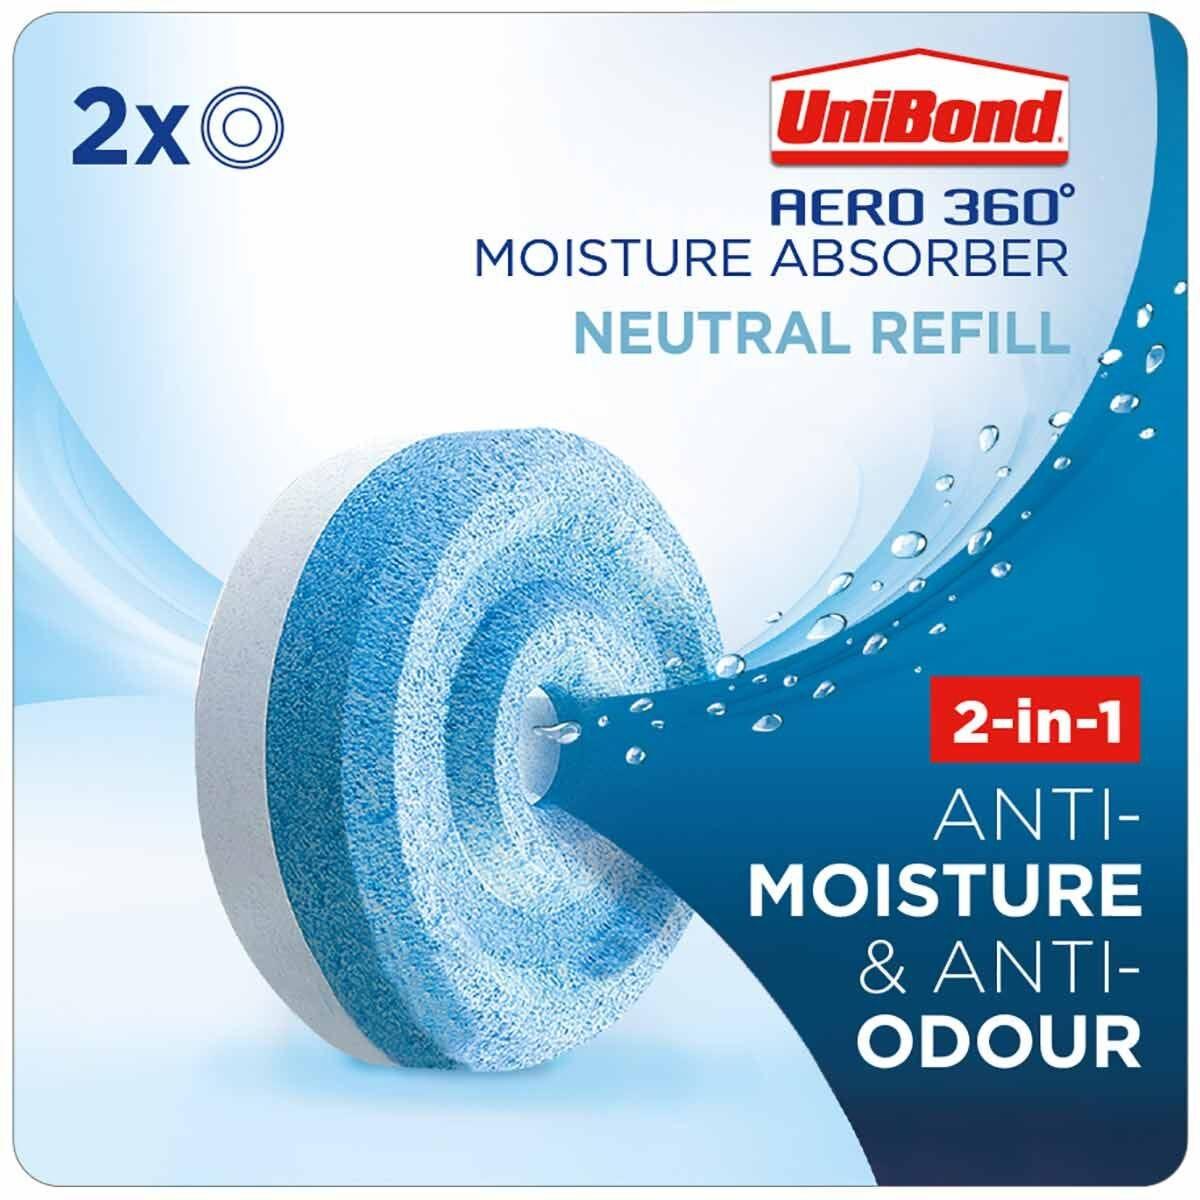 Unibond Aero 360 Moisture Absorber Neutral Refills Pack of 2